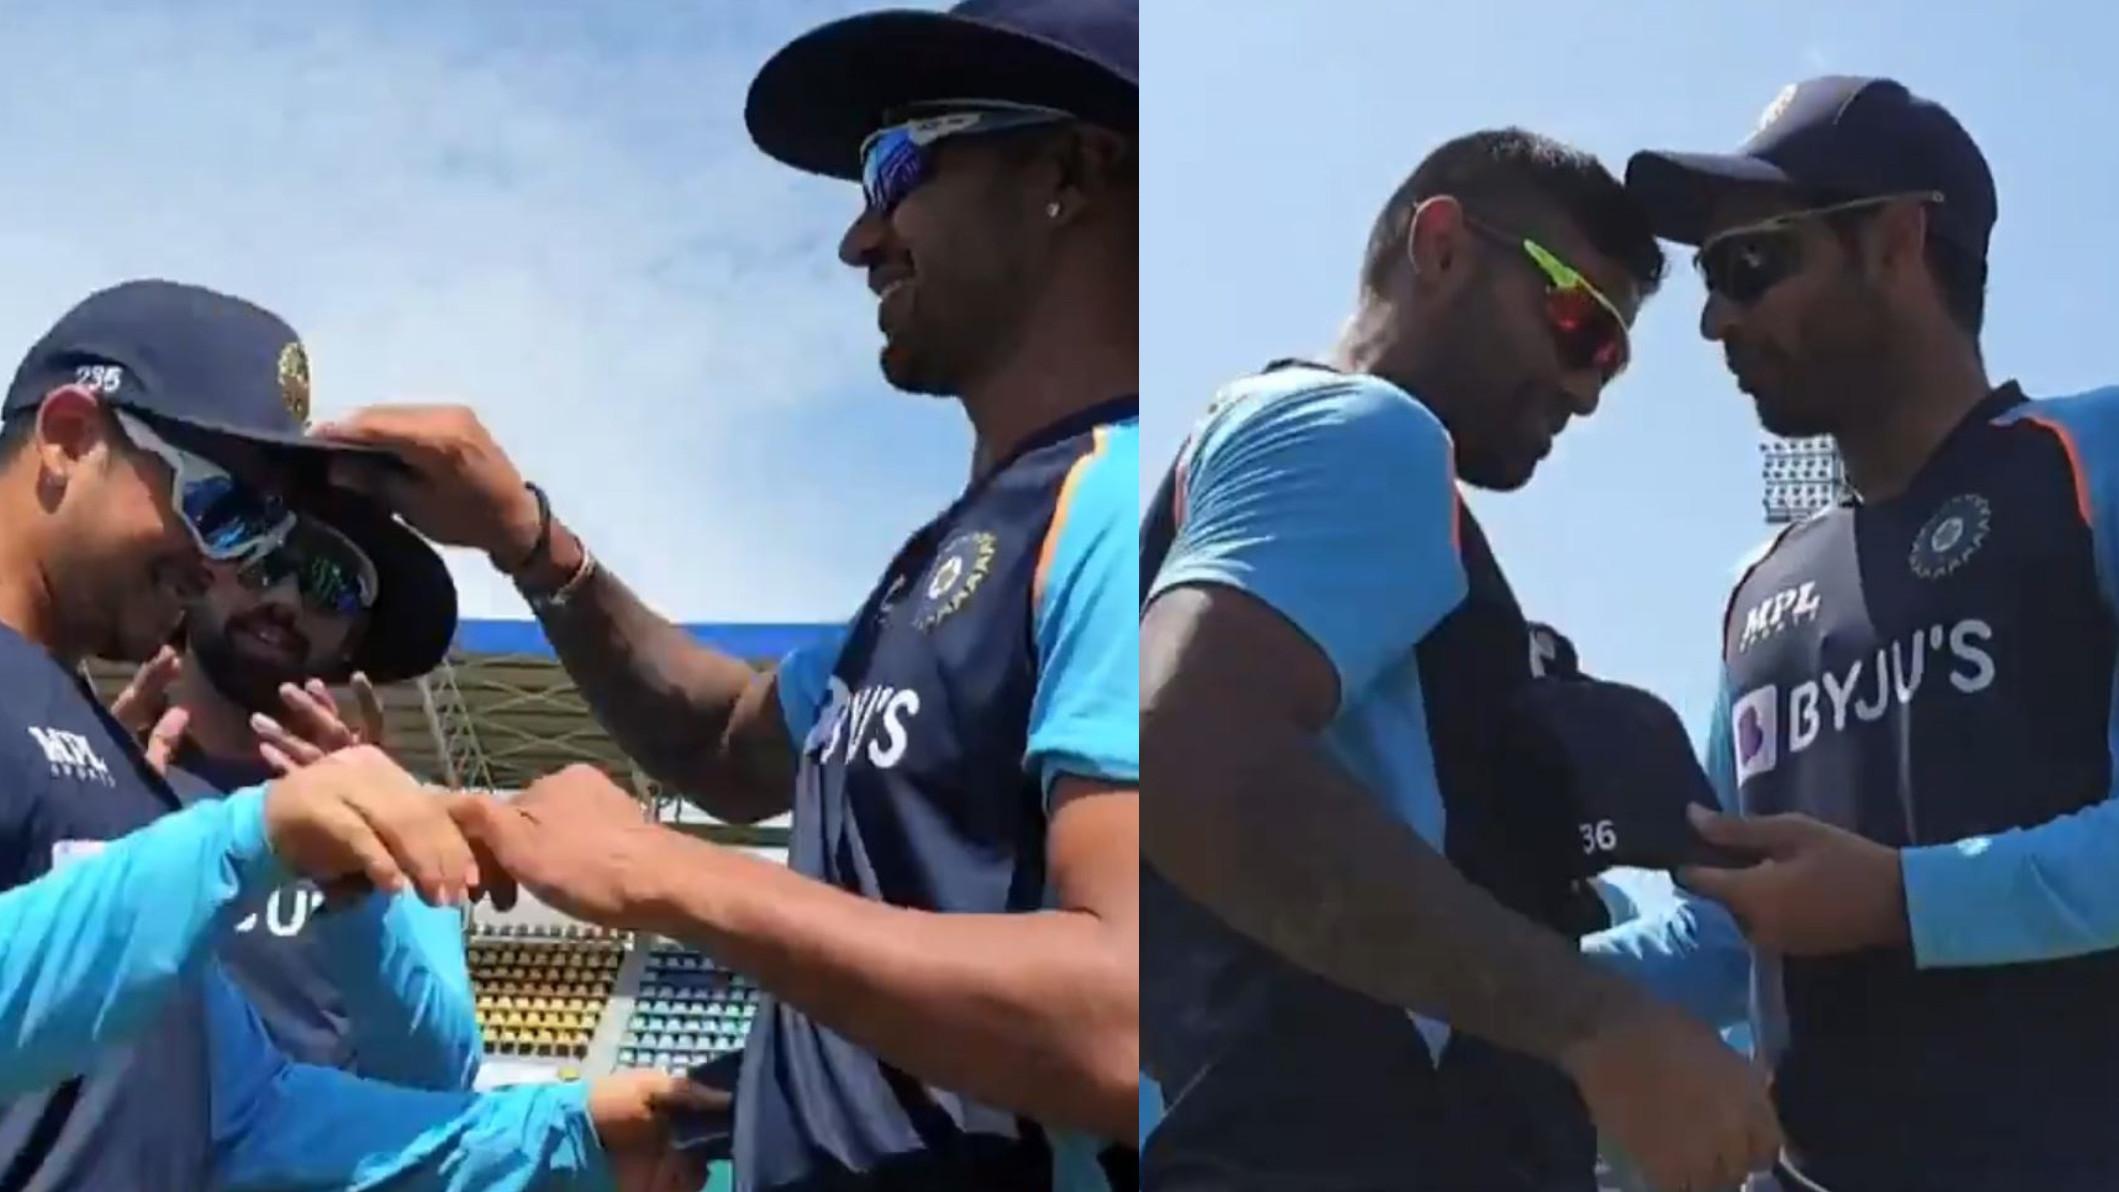 SL v IND 2021: WATCH- Ishan Kishan and Suryakumar Yadav receive their debut caps before 1st ODI vs Sri Lanka